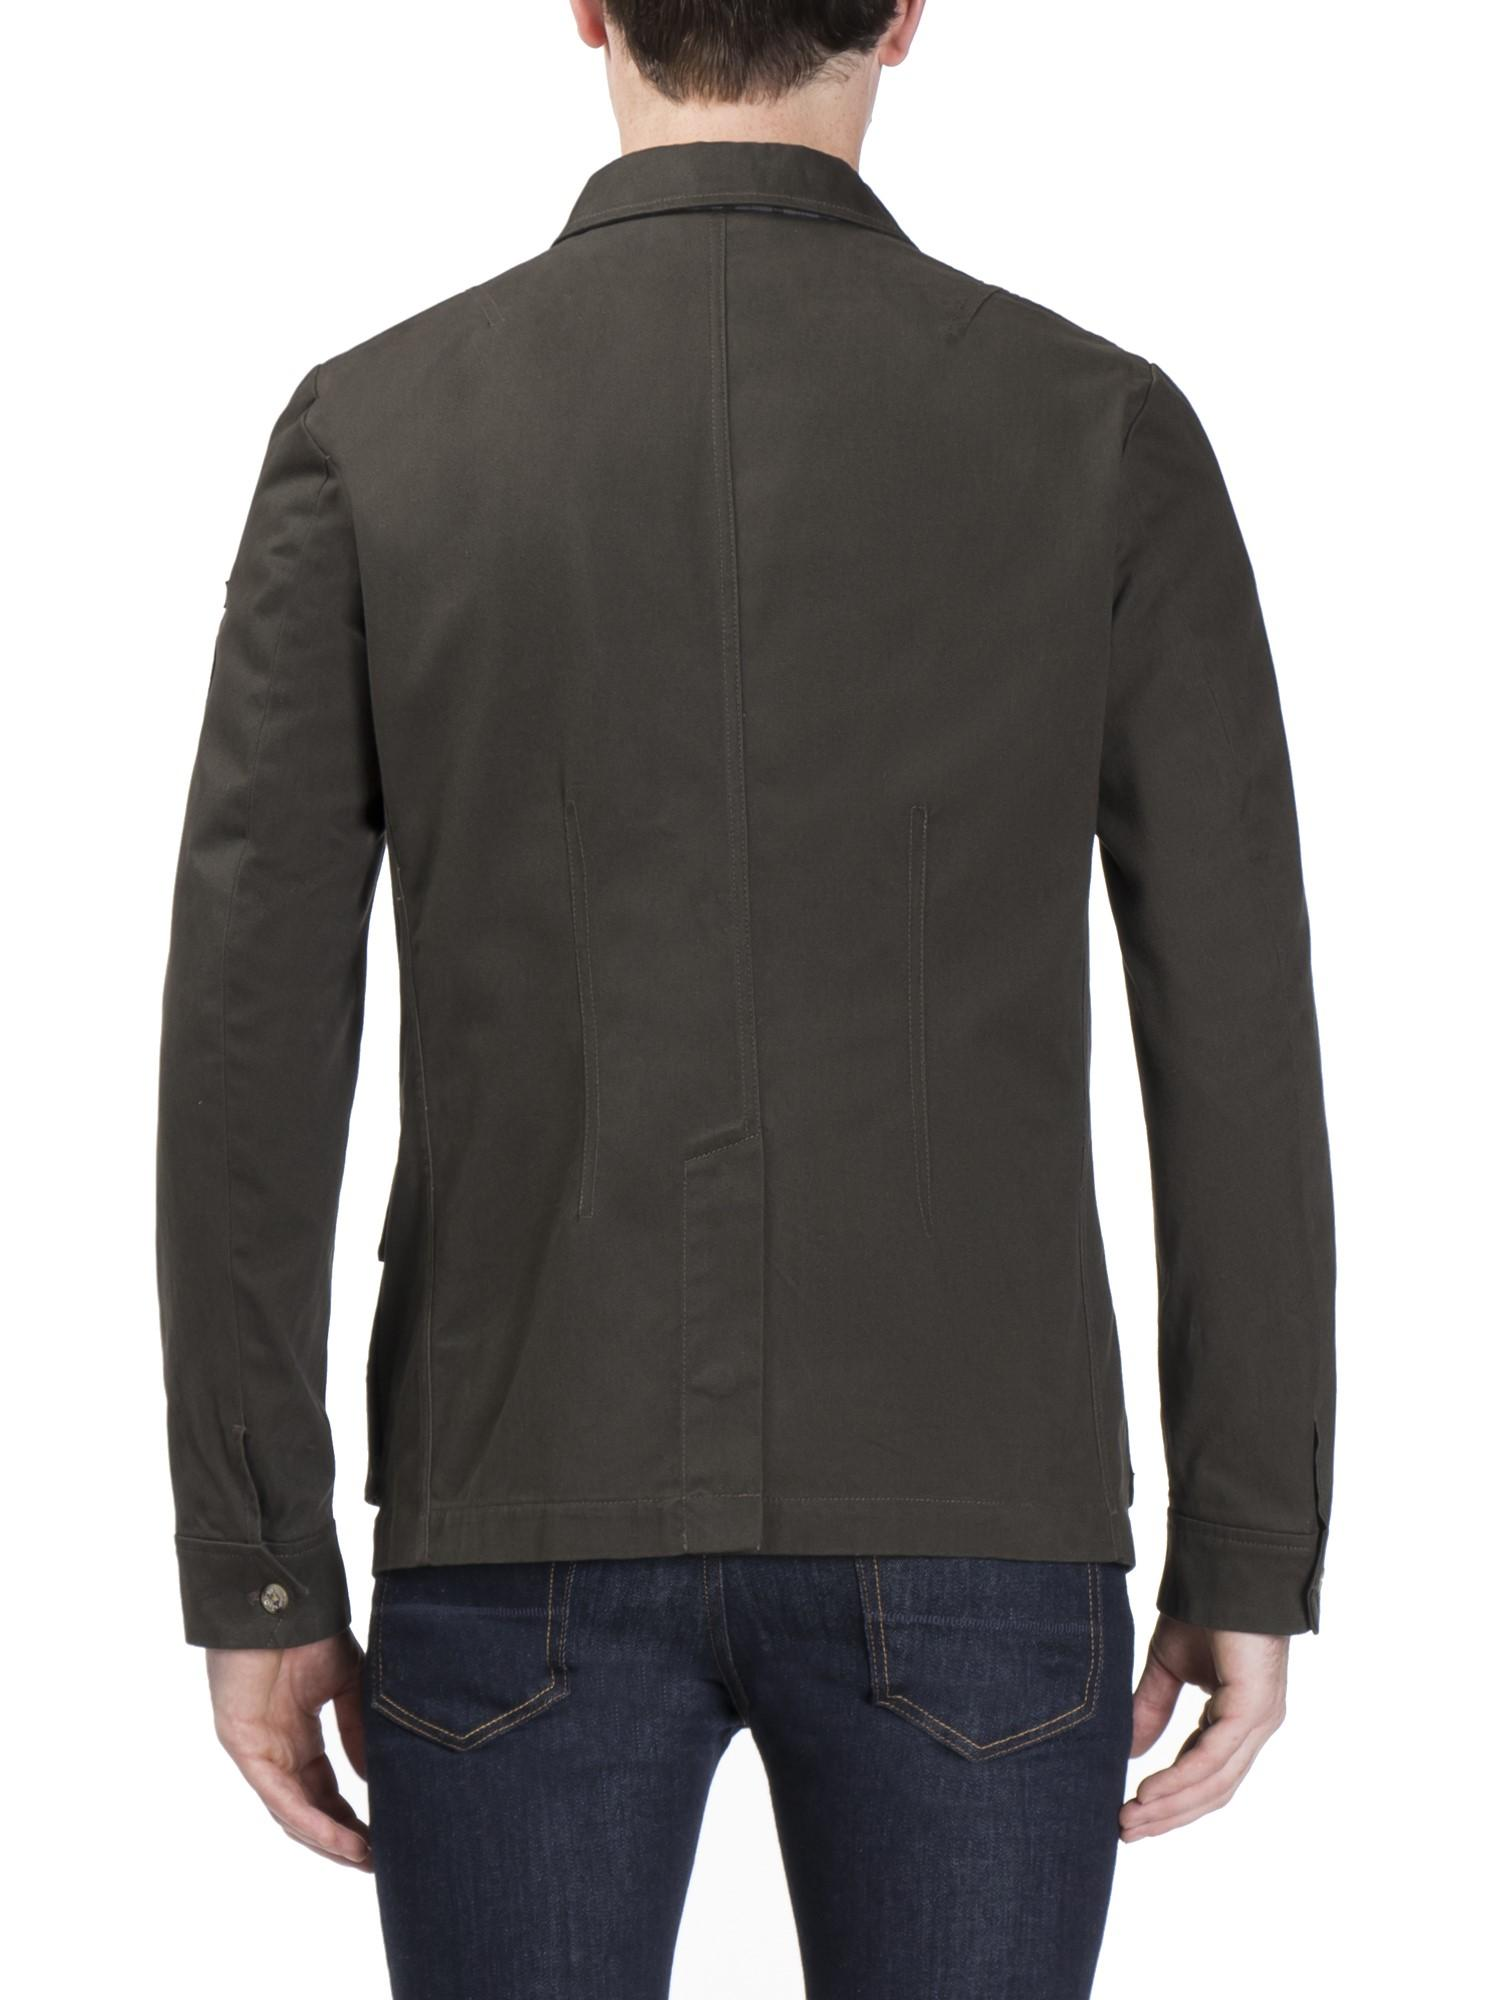 Ben Sherman Cotton Military Style Jacket for Men